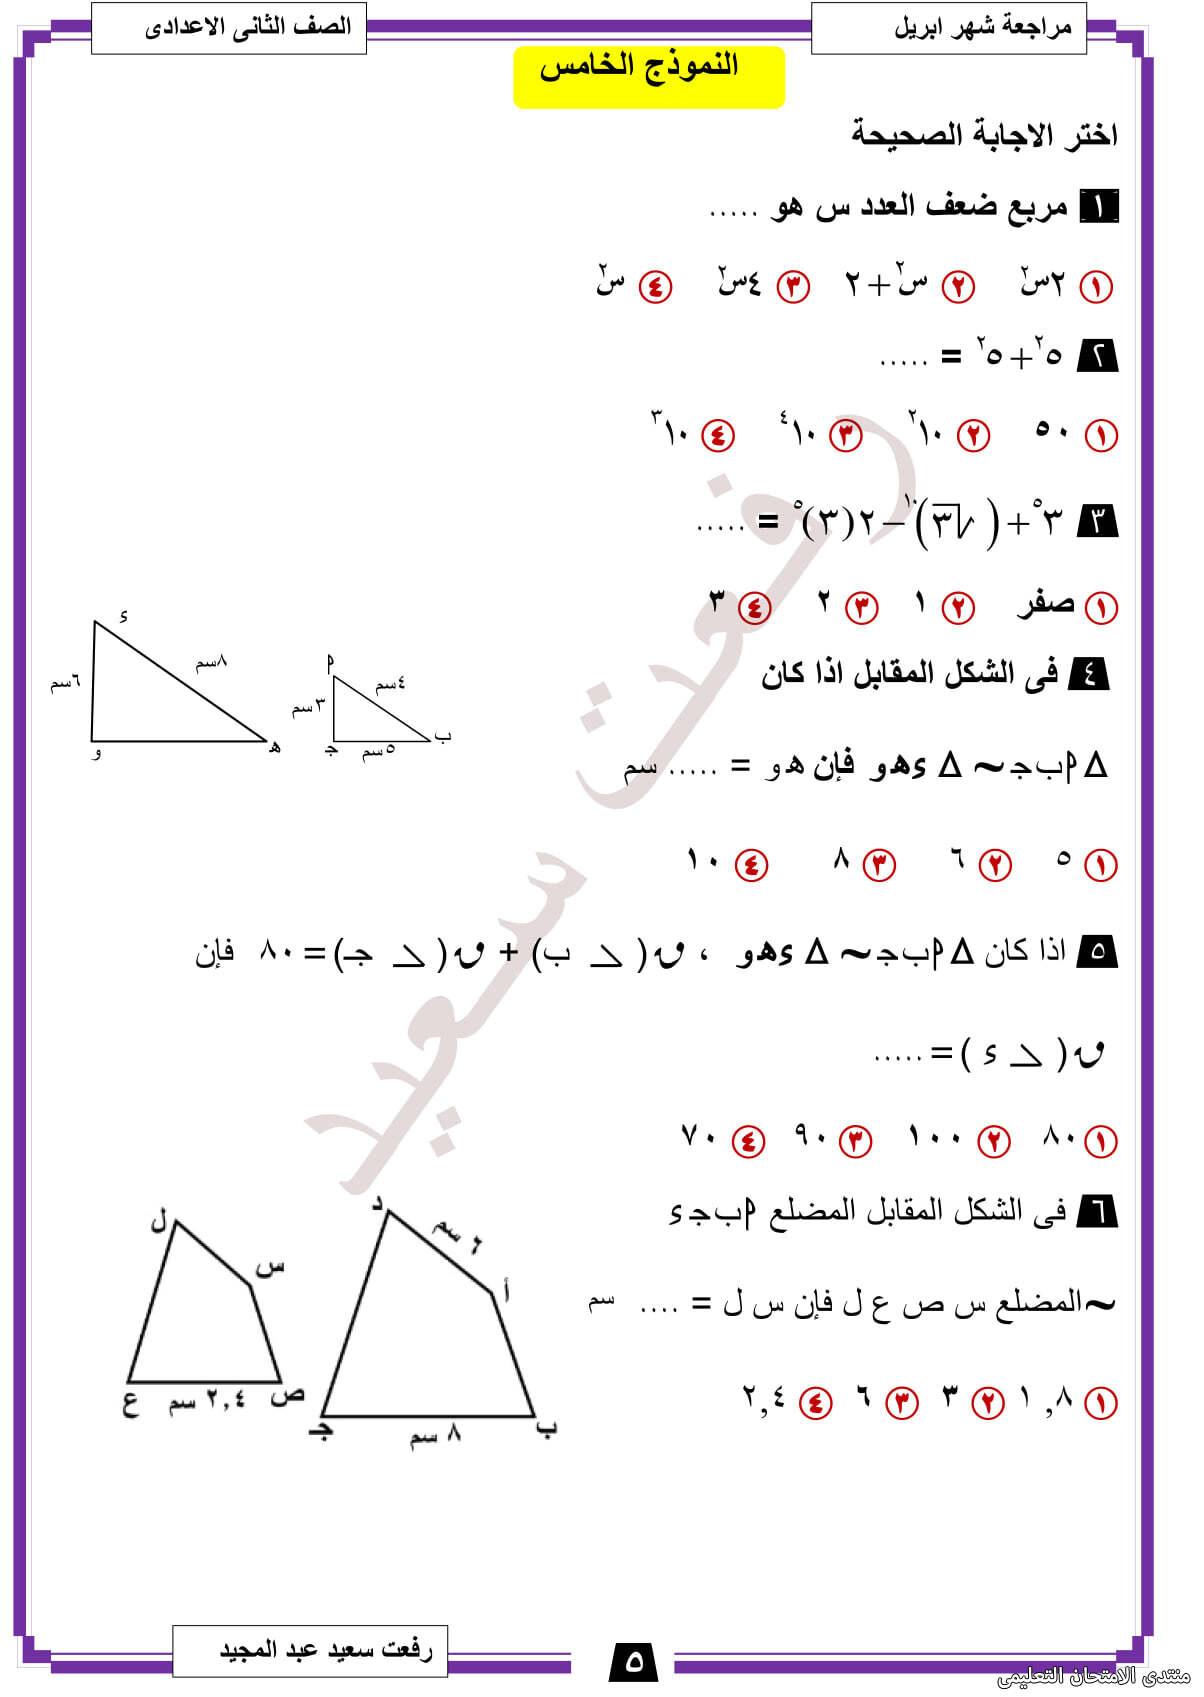 exam-eg.com_161904908770325.jpg